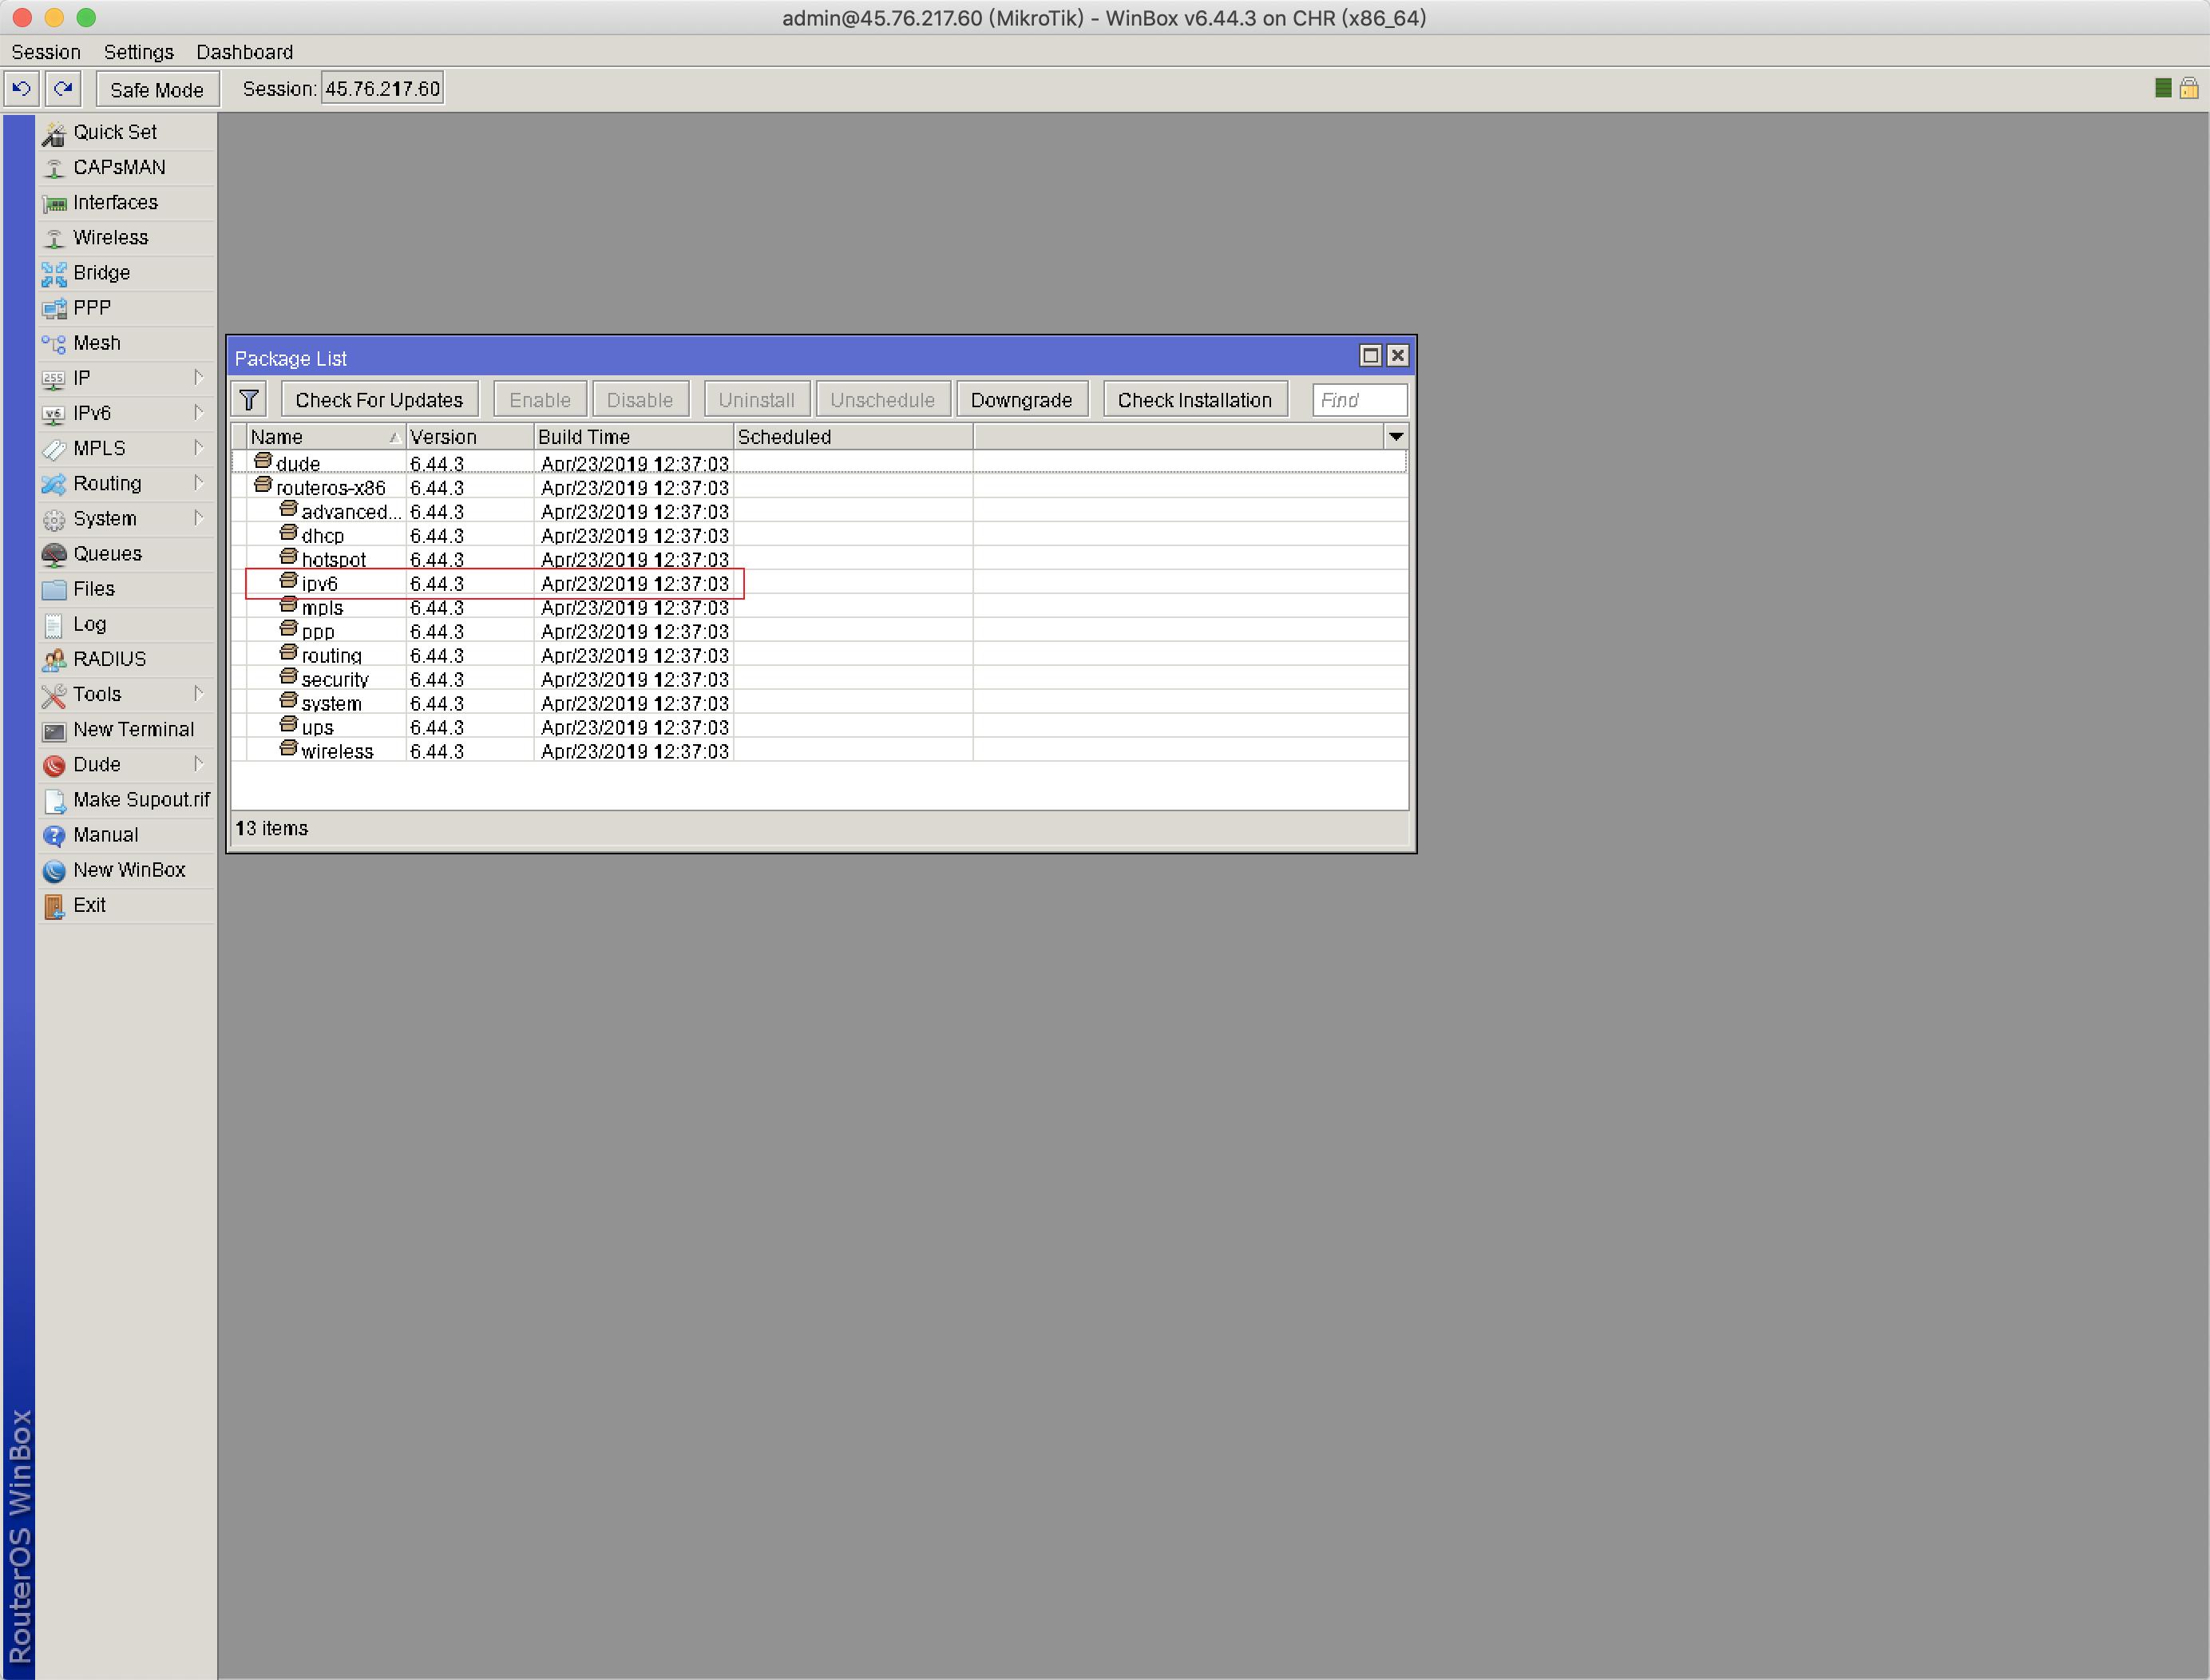 Vultr 安装Mikrotik RouterOS后配置IPV6和IPV6 BGP